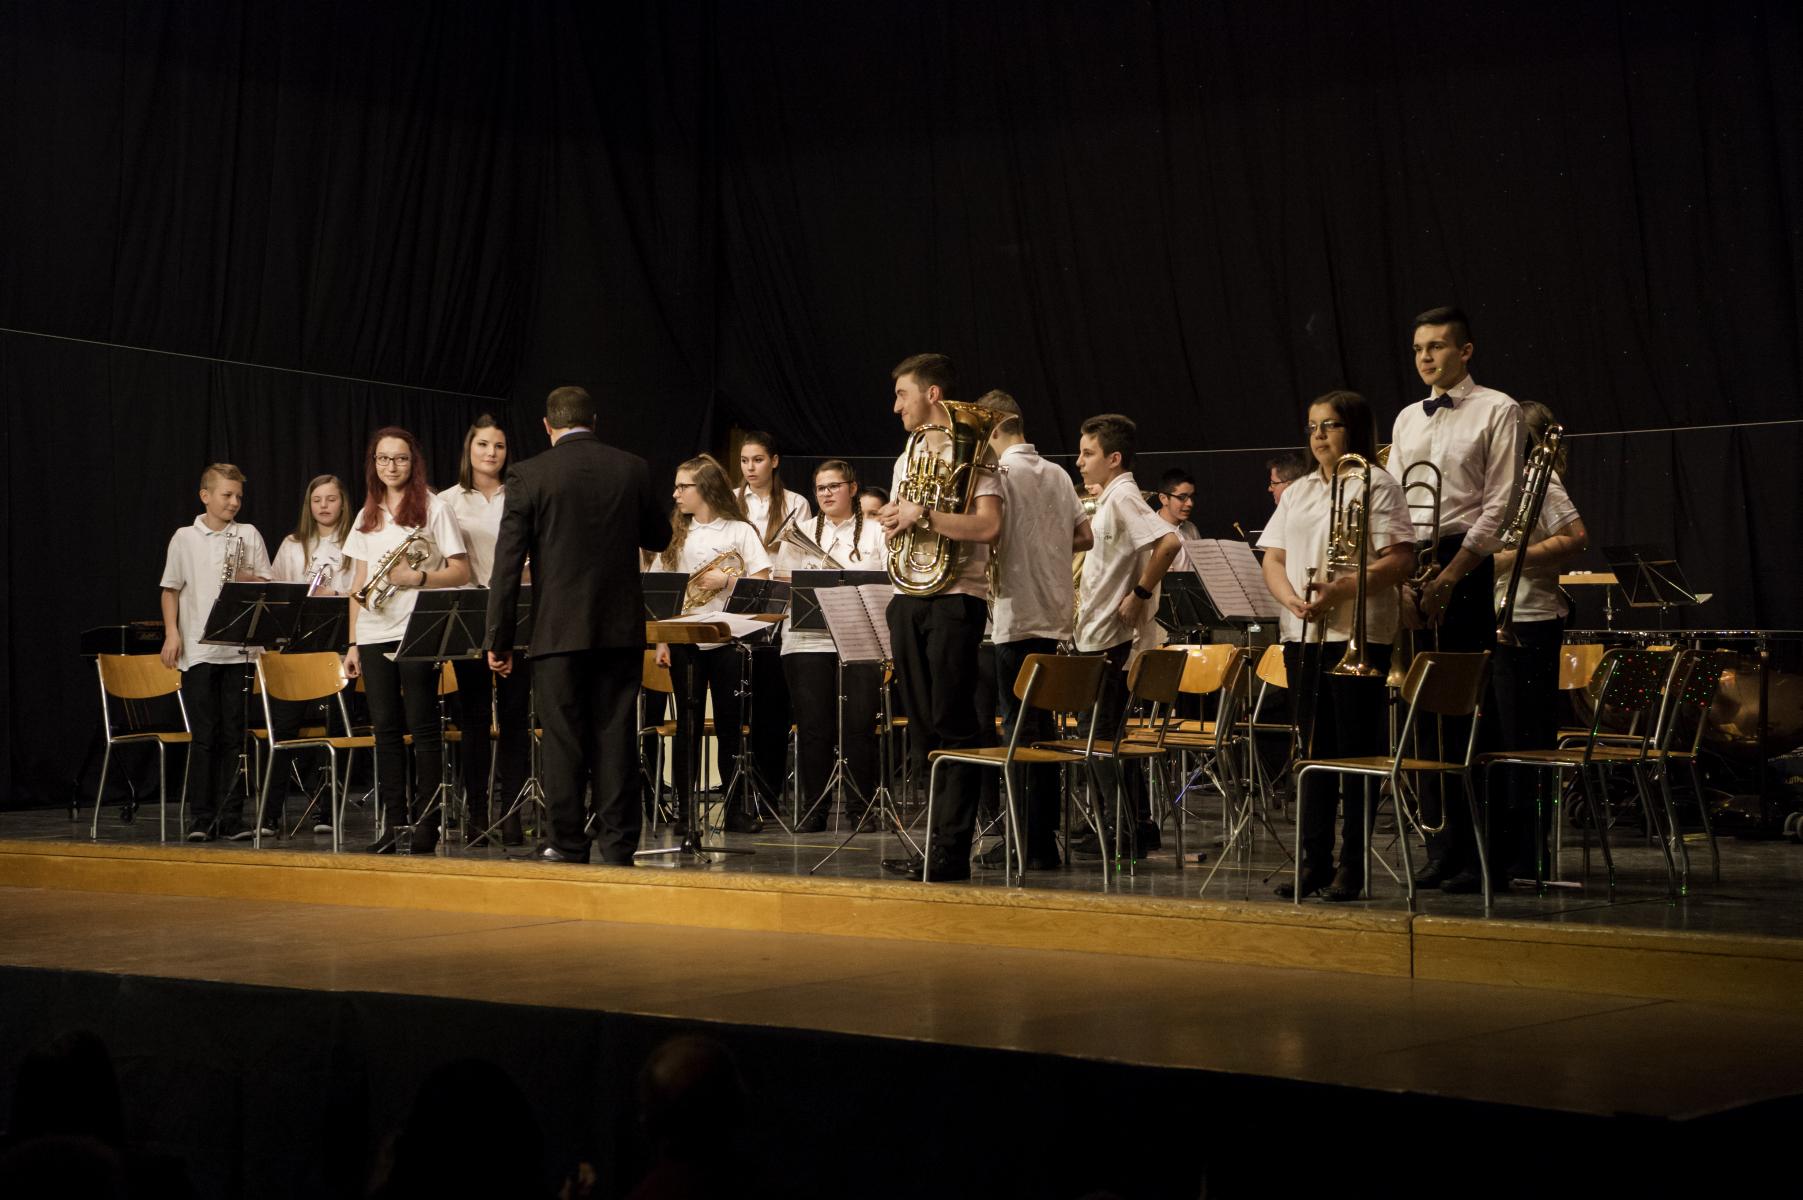 170211_concert_annuel17-016